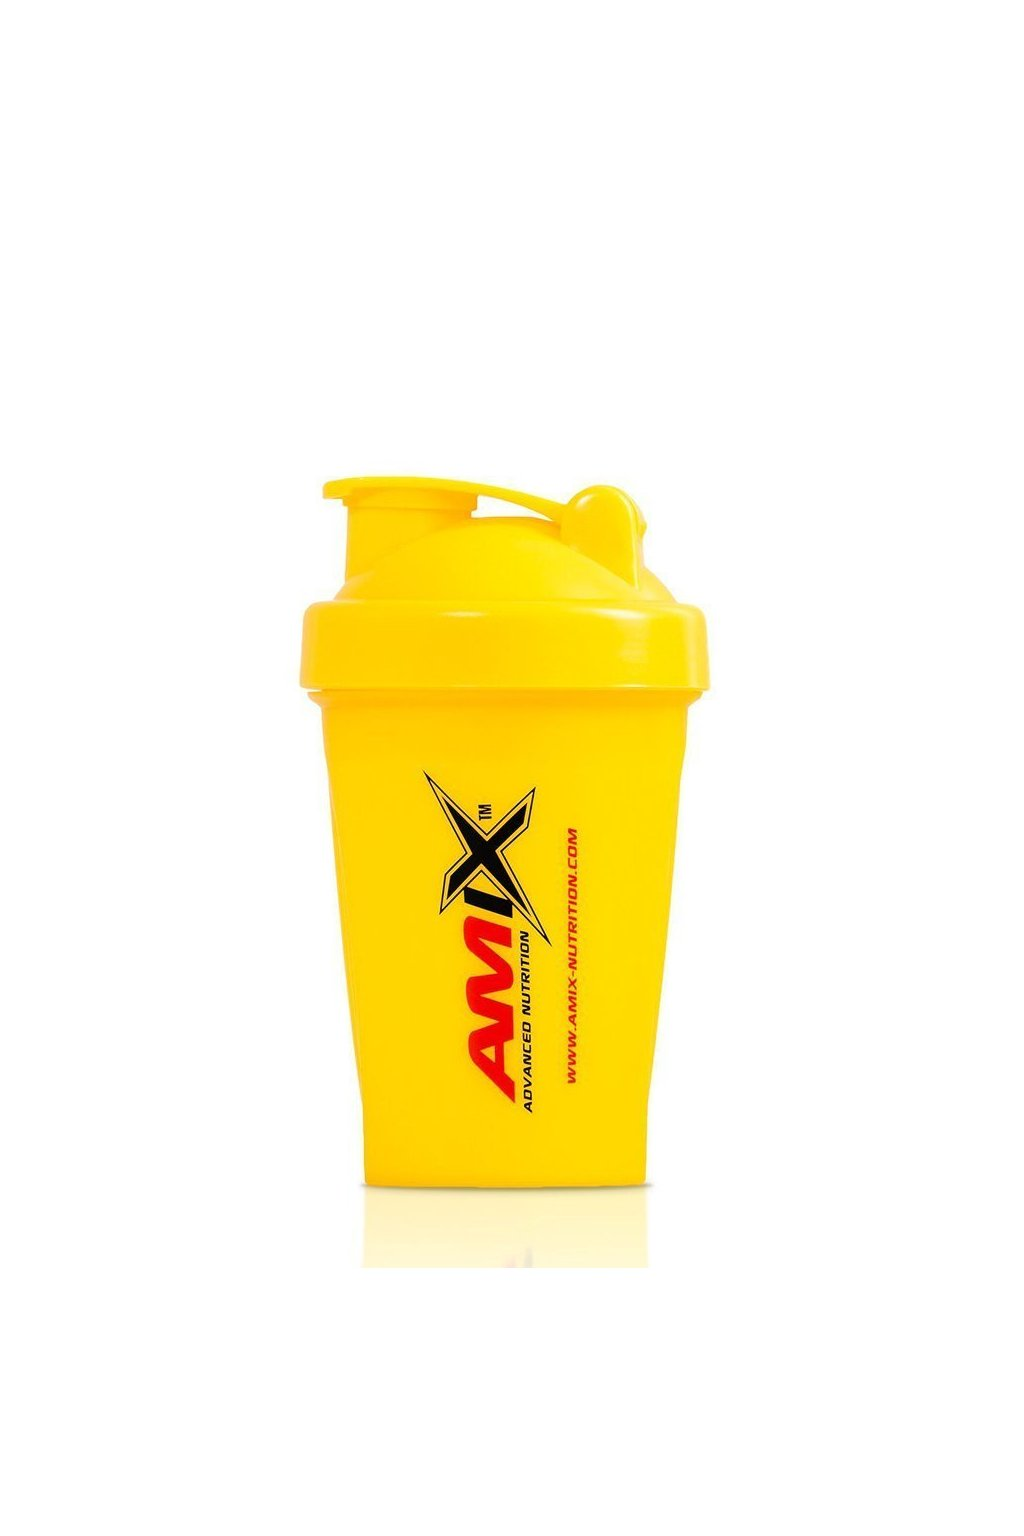 AX 00252 yellow 1